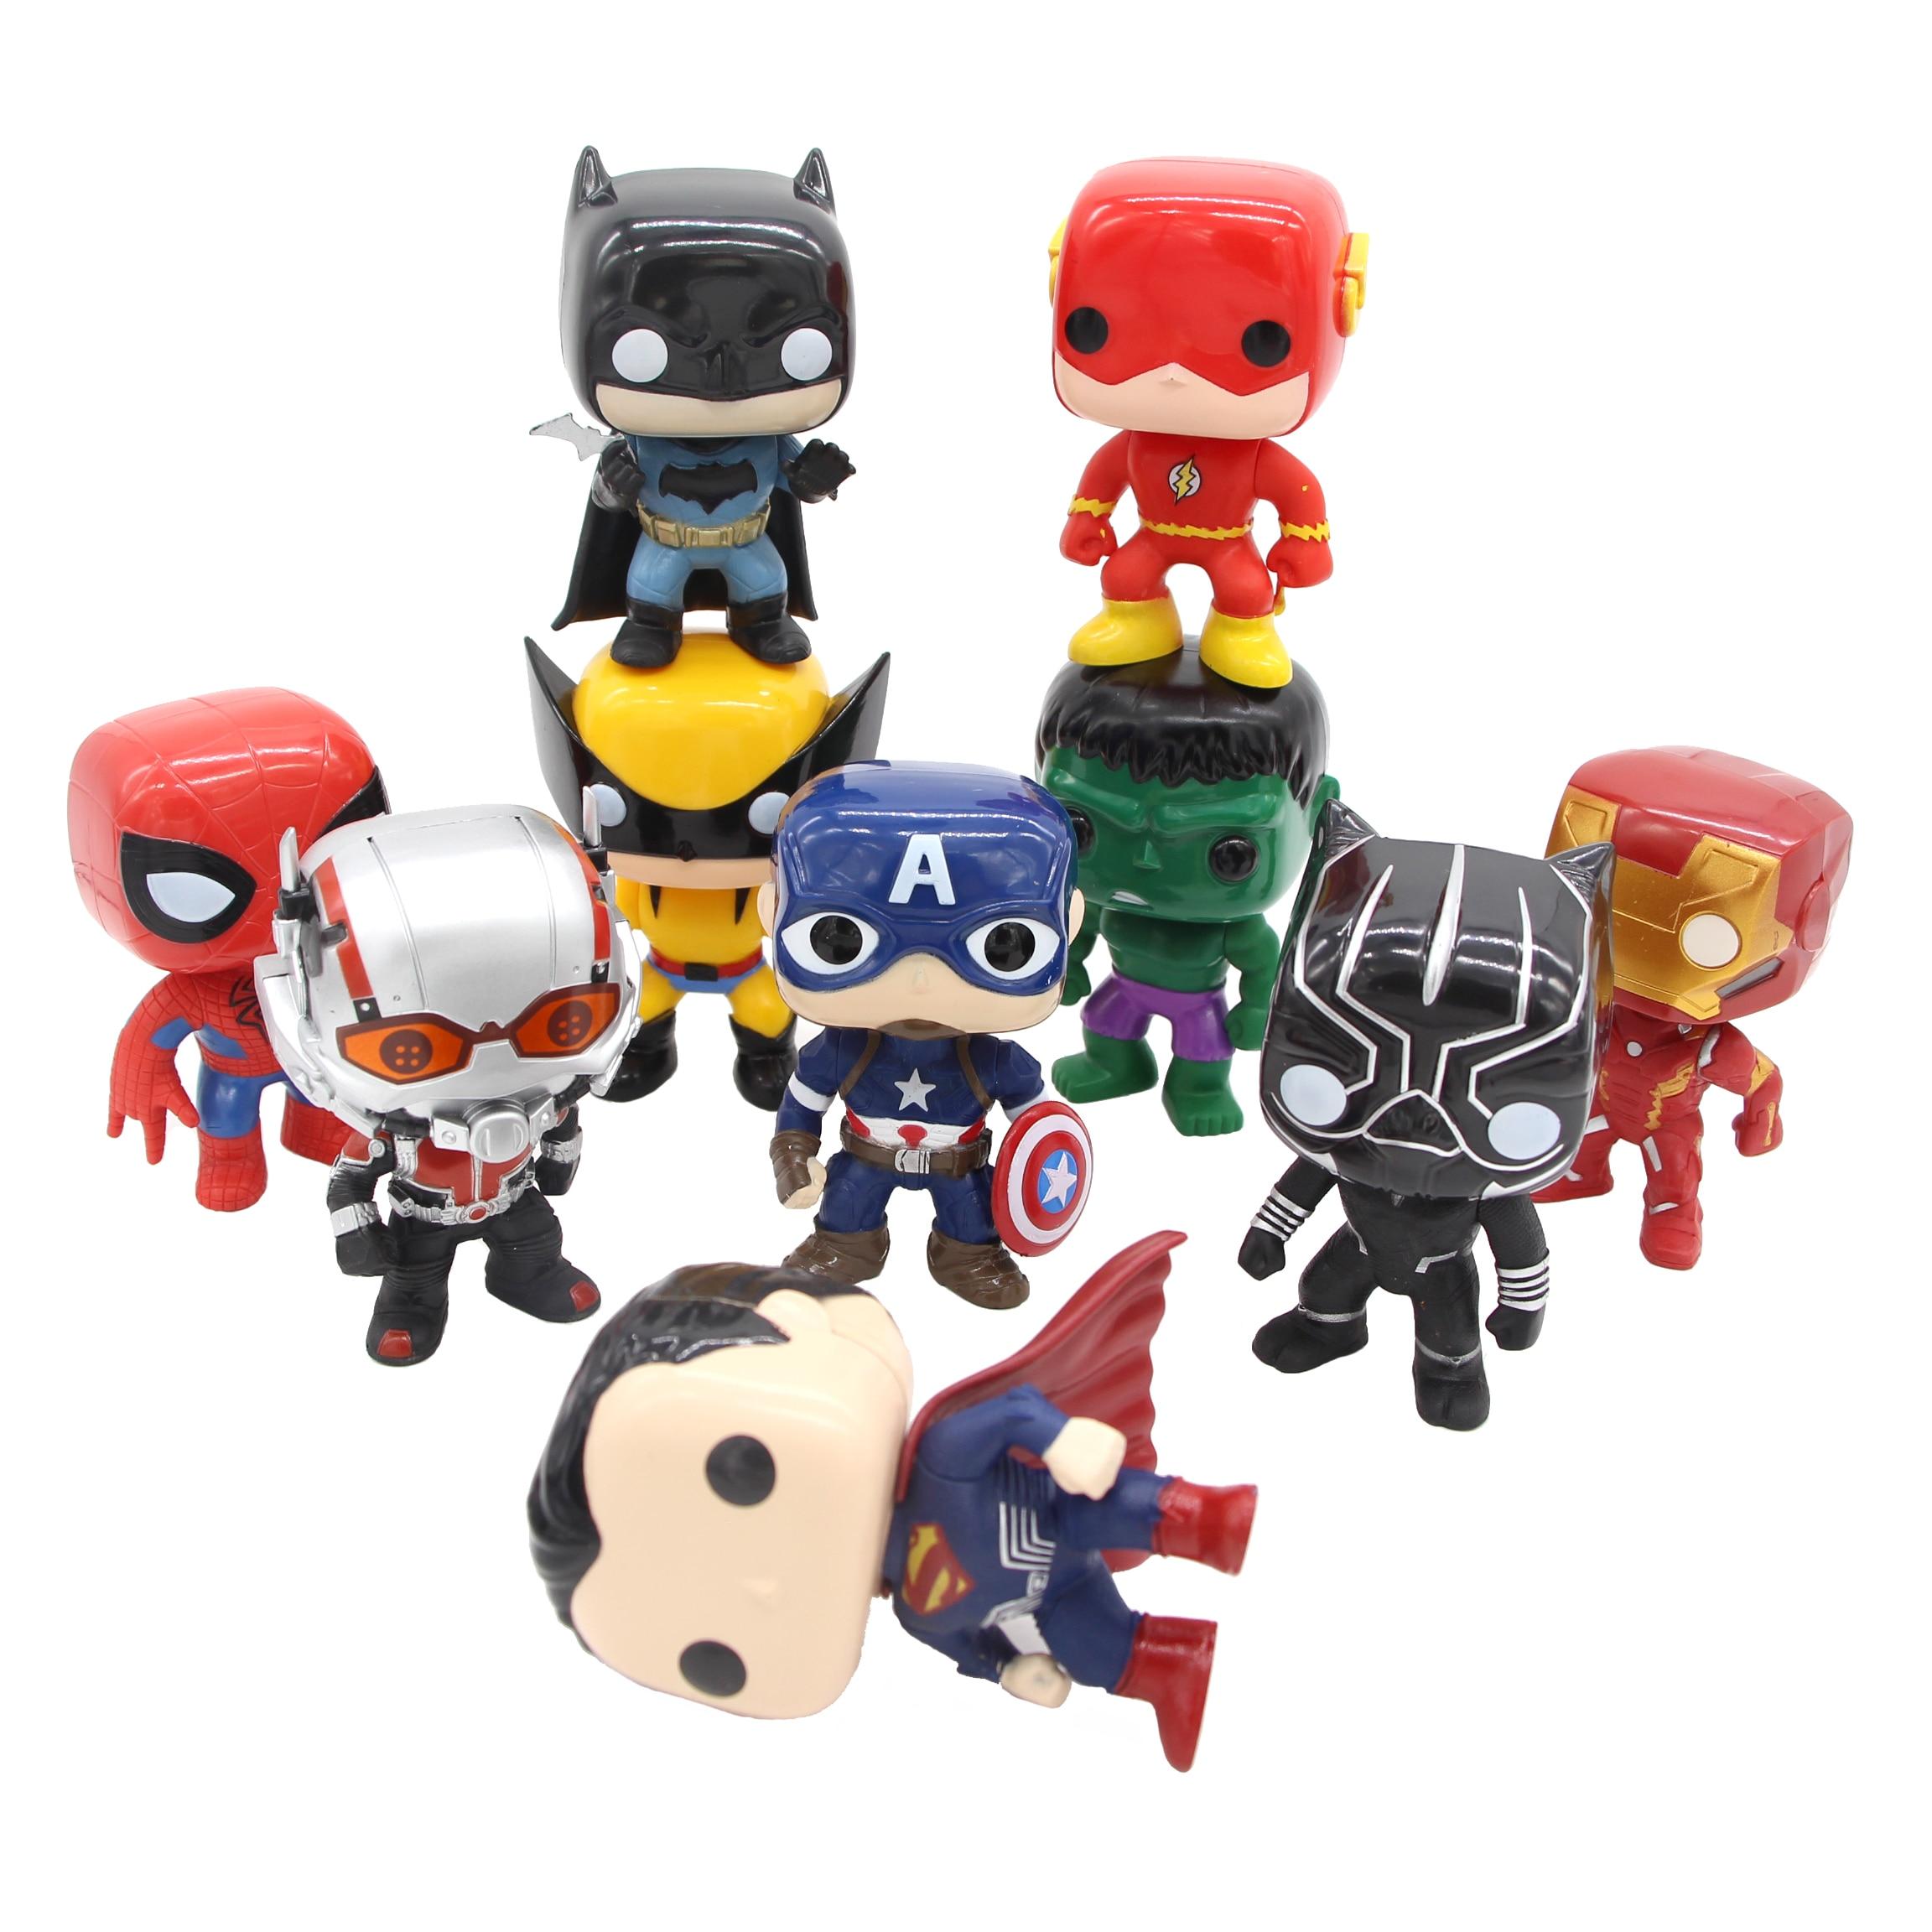 10st / set DC Justice League & Marvel Avengers Super Hero Tecken 10cm - Toy figuriner